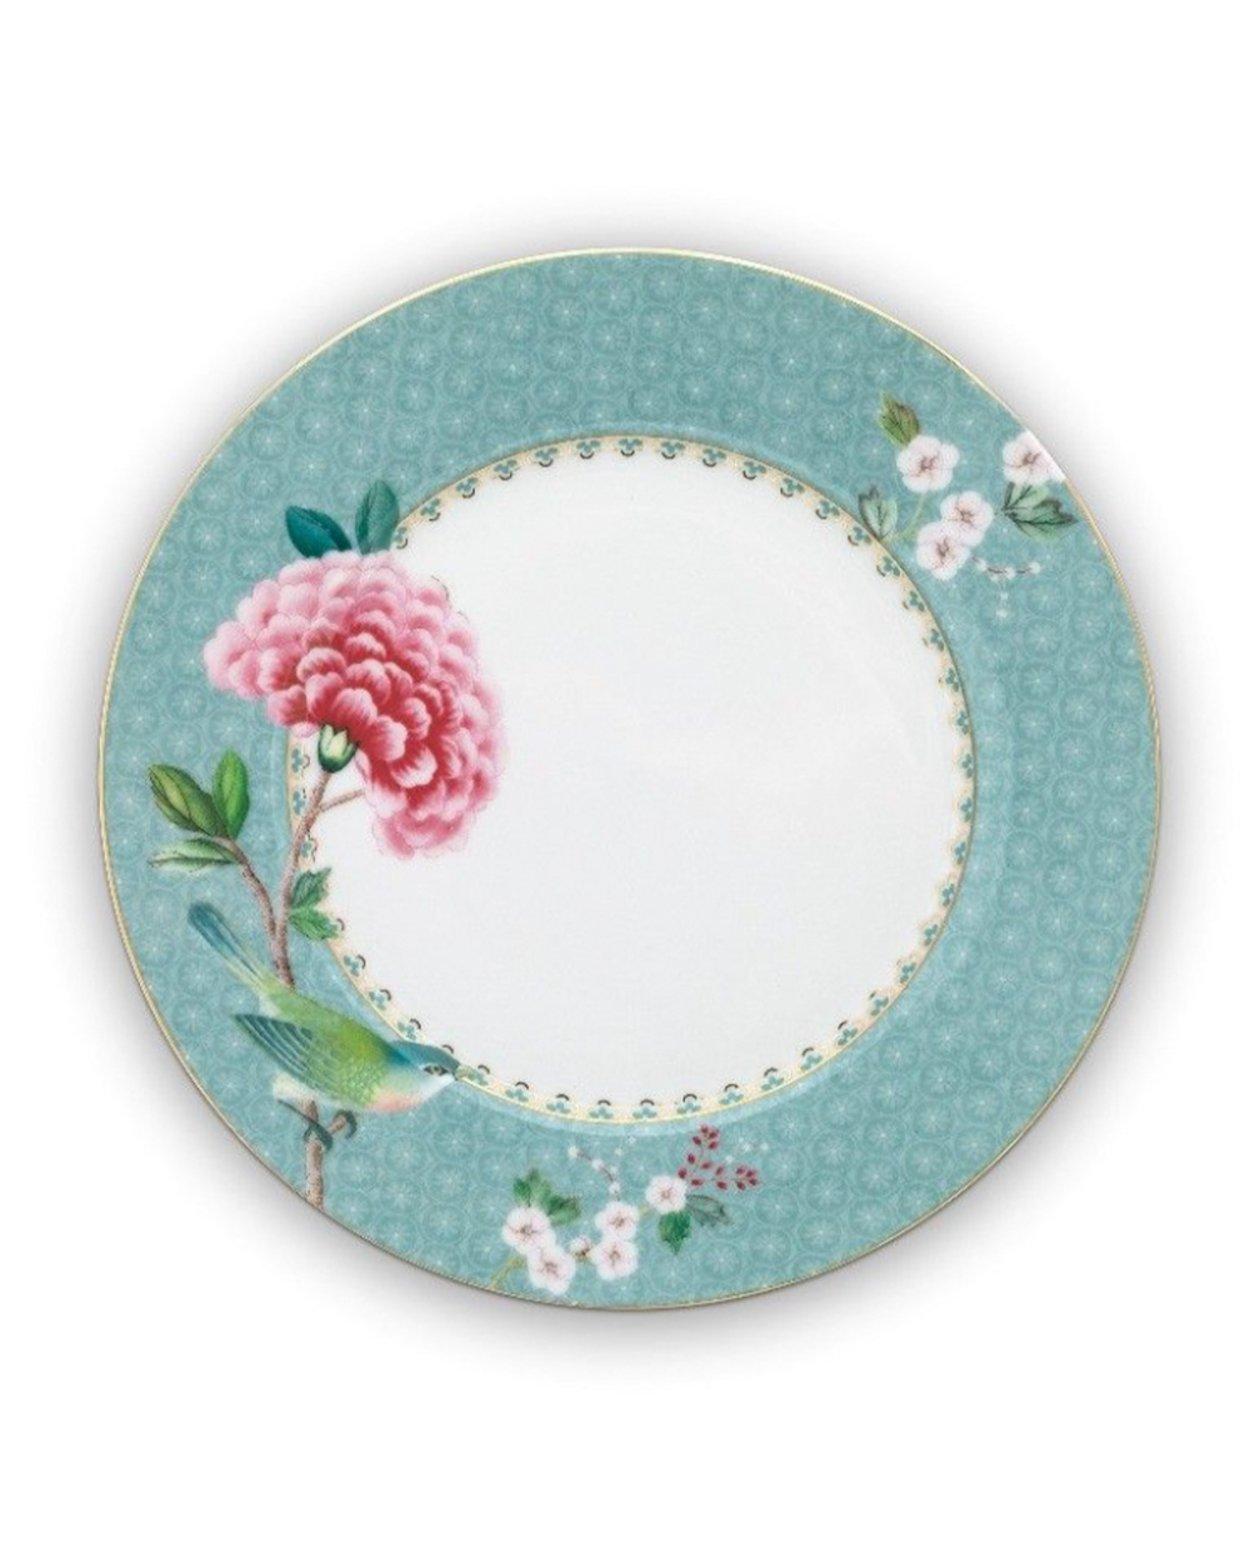 Blushing Birds Plate - Blue - 21cm